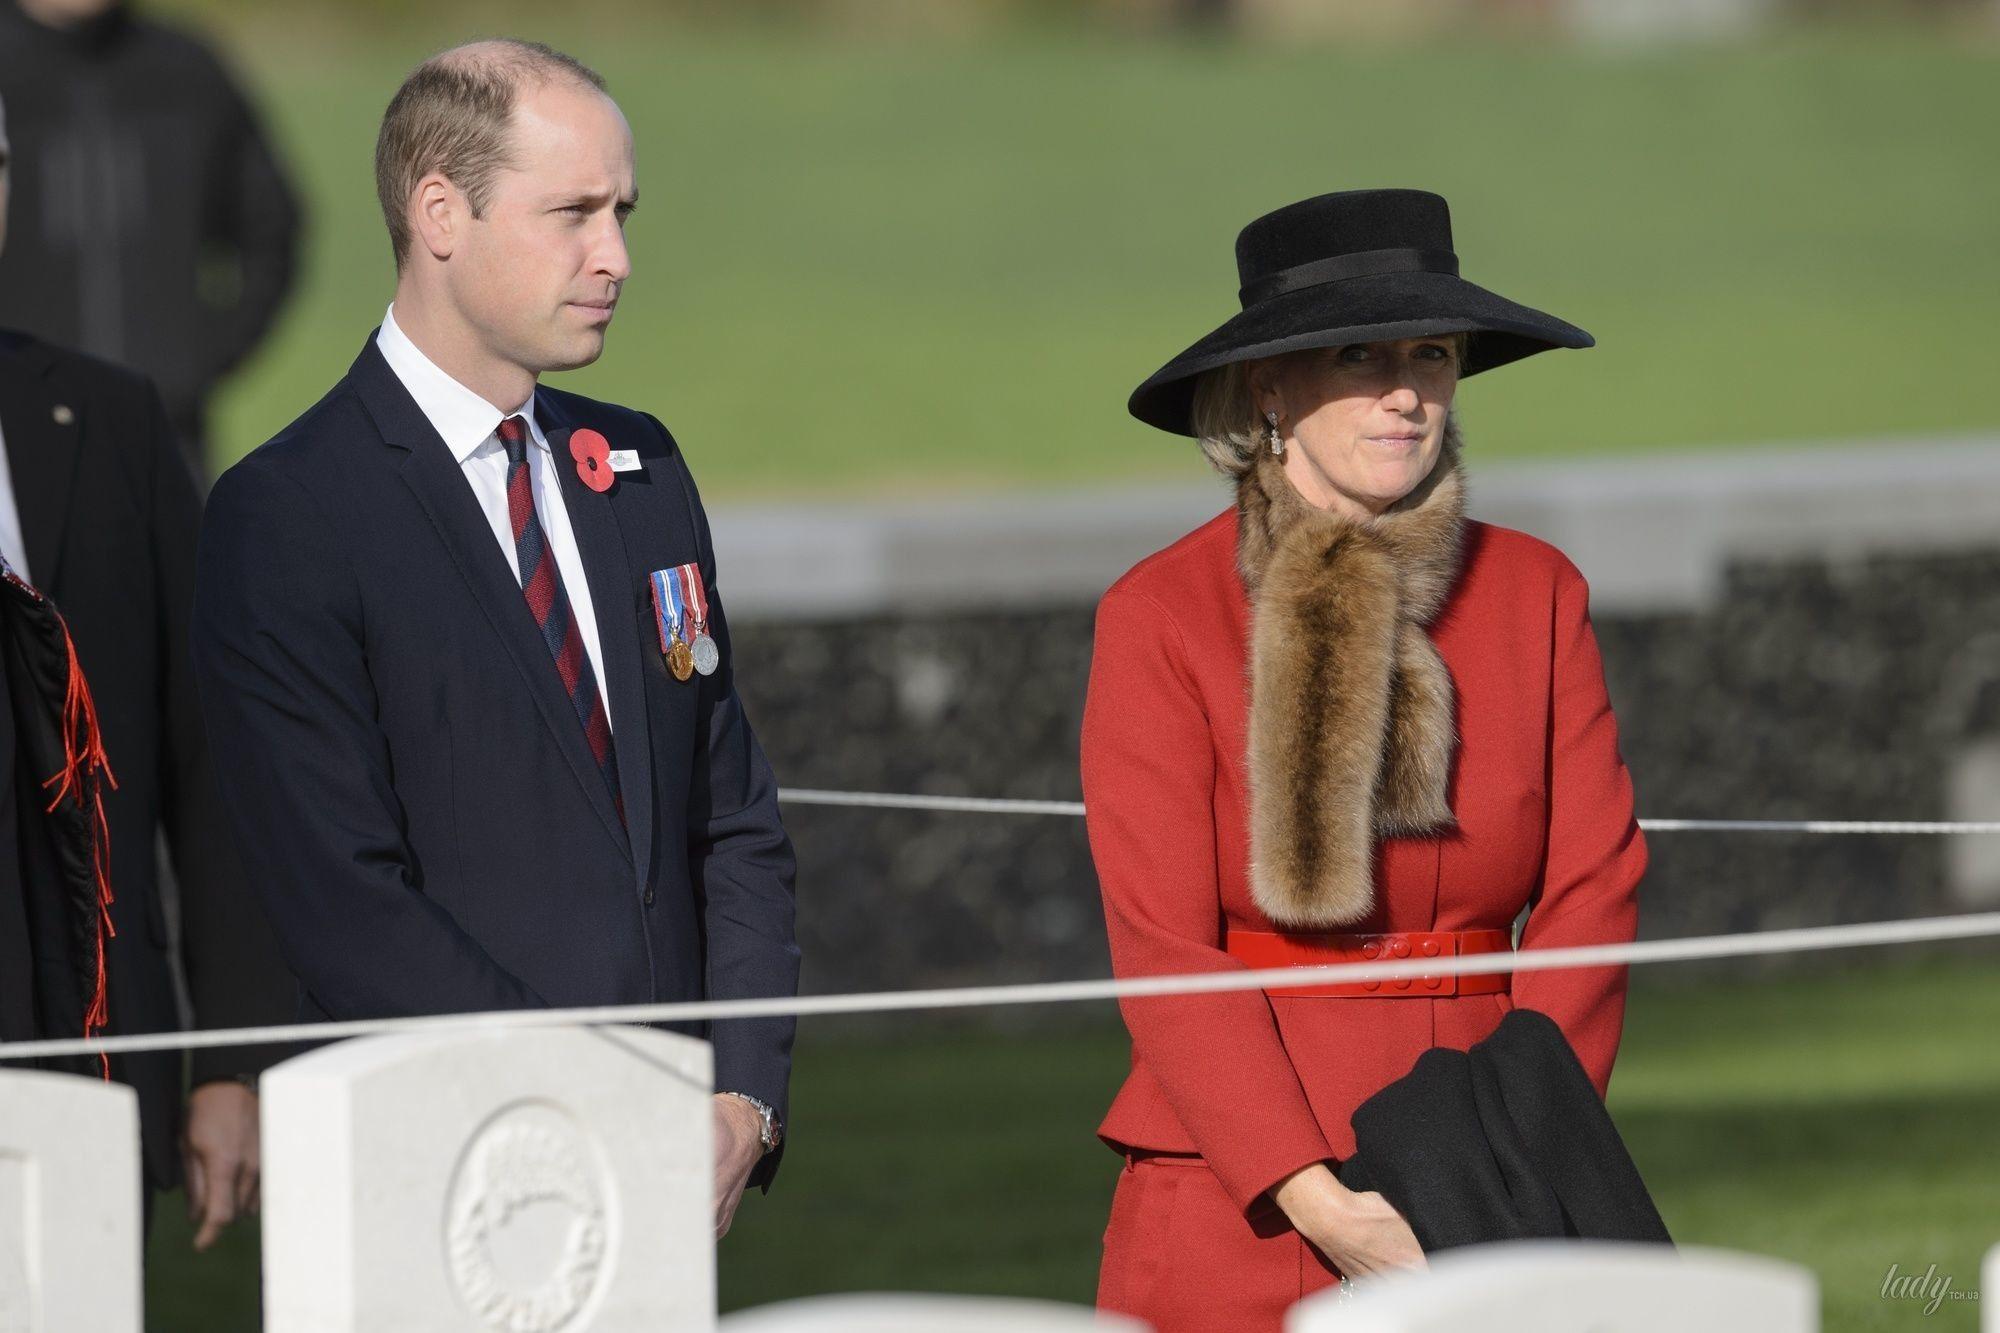 Принц Уильям и принцесса Астрид_2